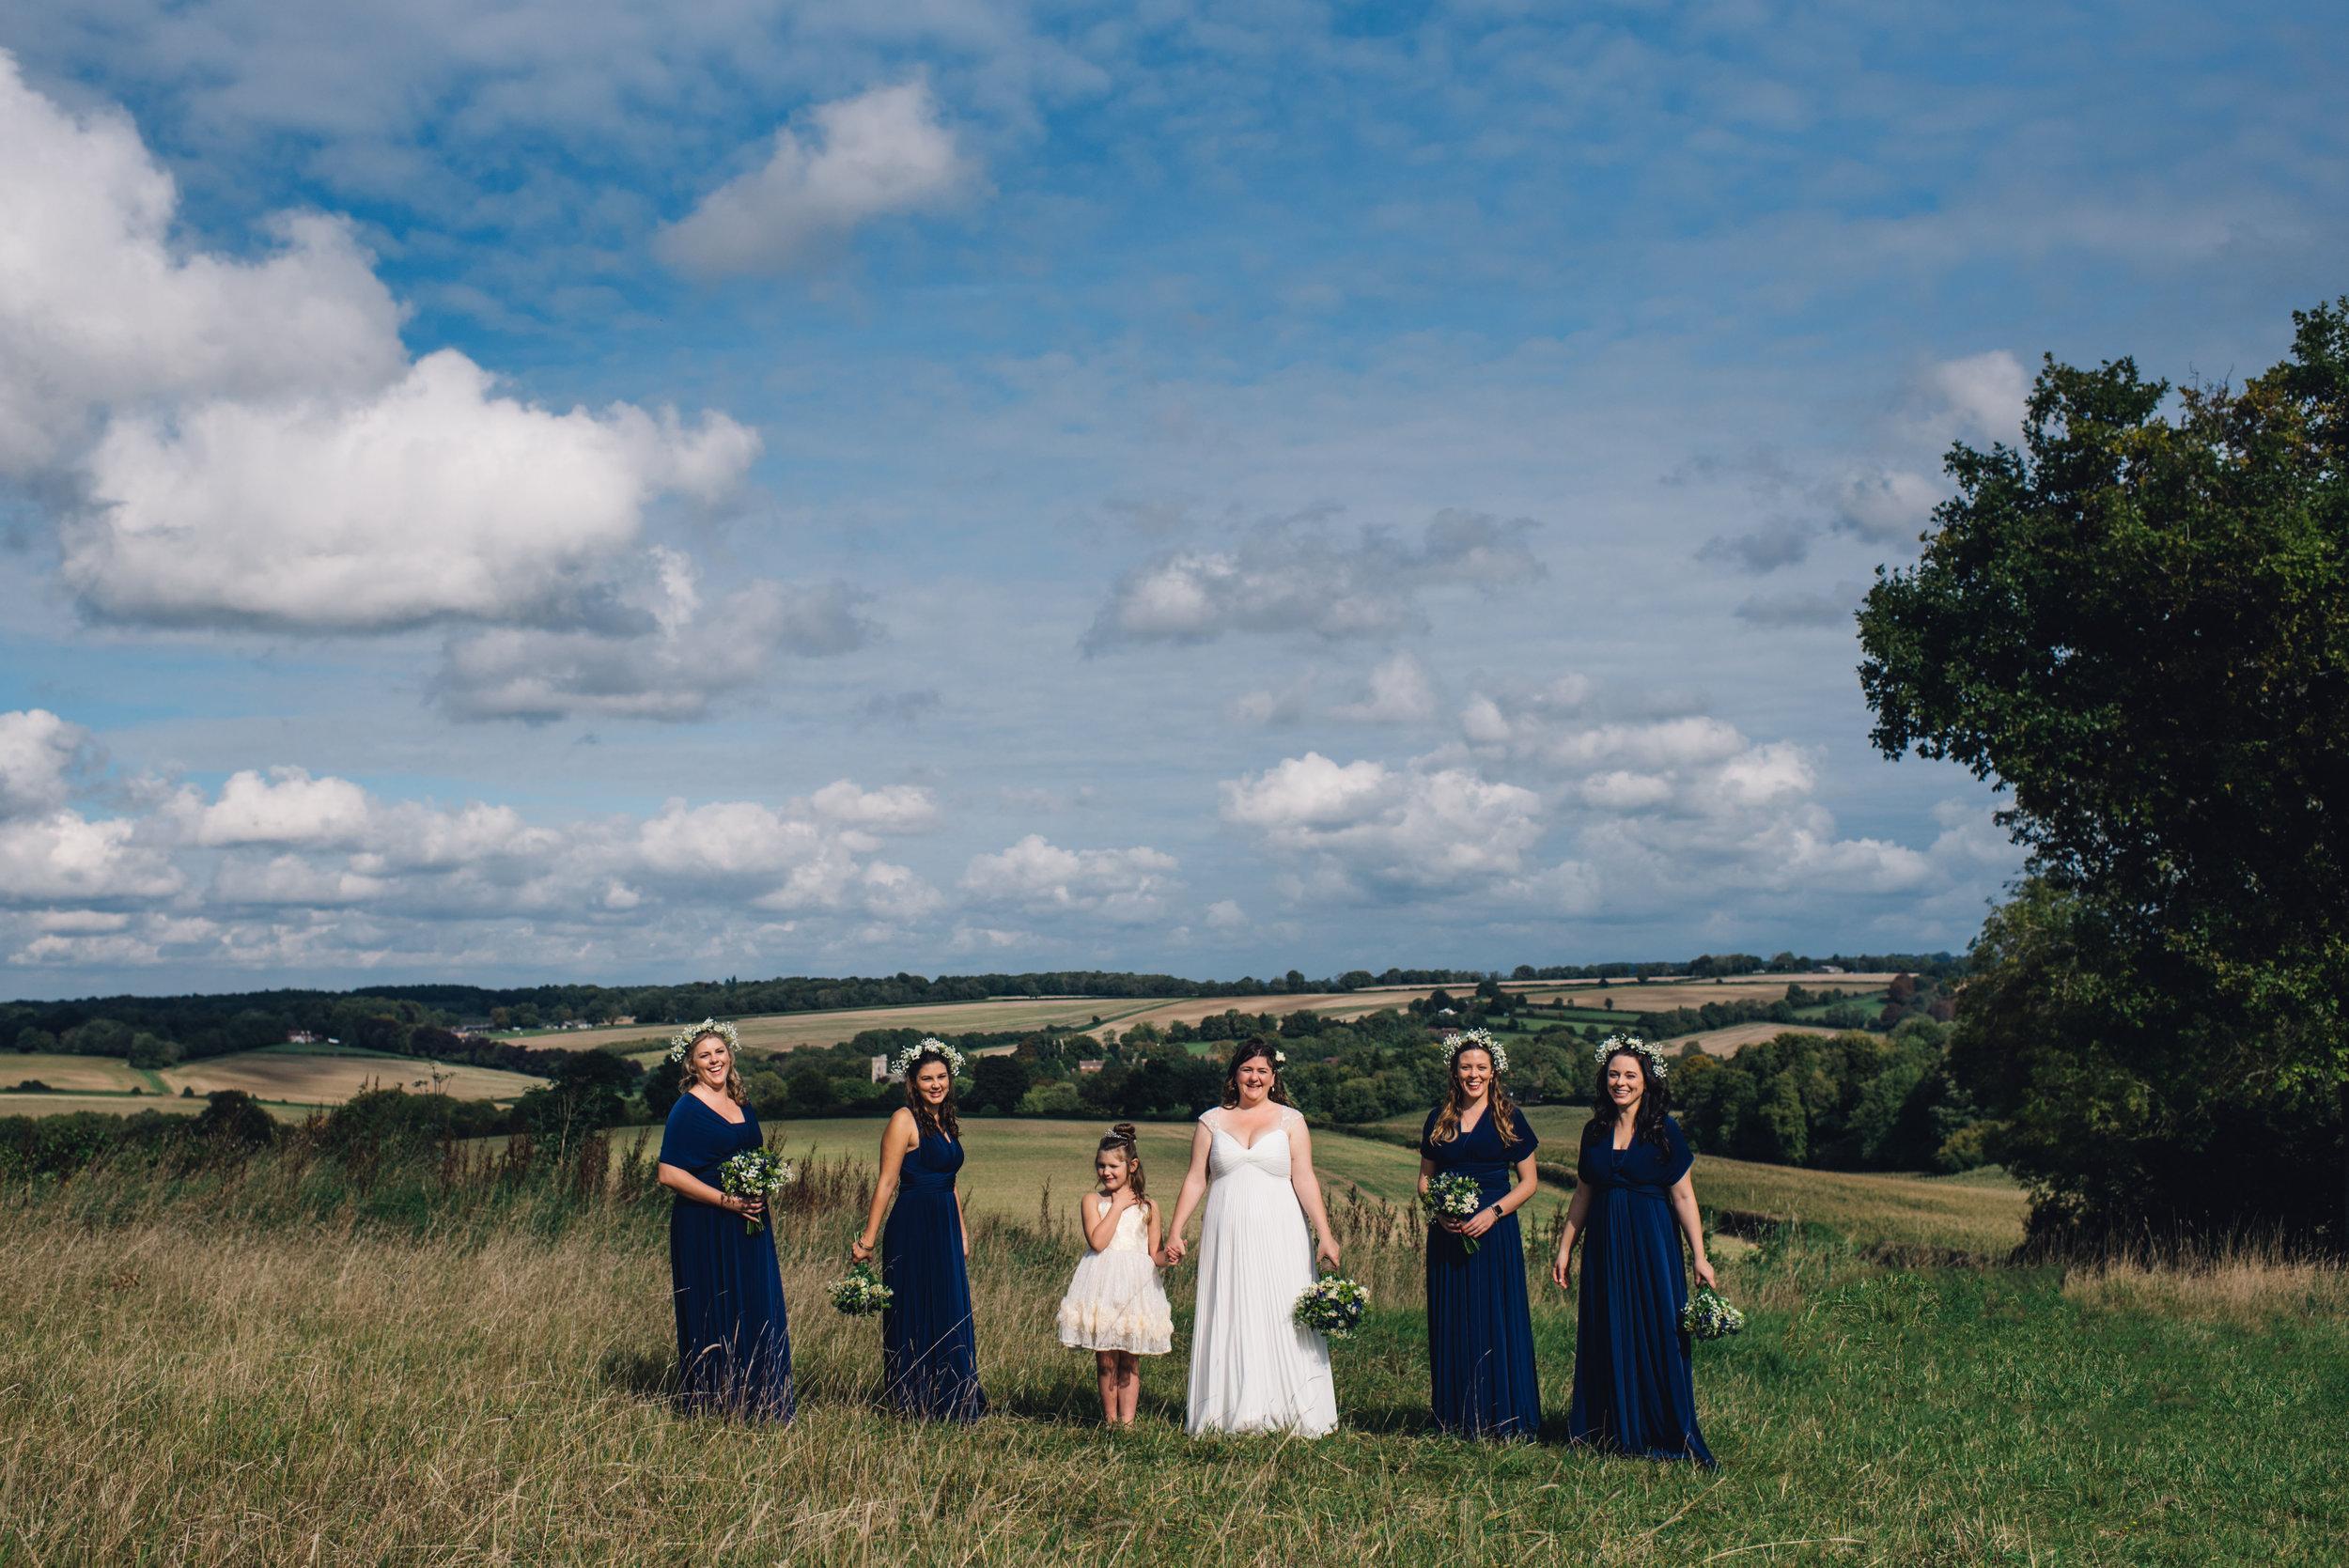 10 HampshirWEdding Photographer Bride Groom Queen Elizabeths County Park Summer Wedding Bridal Party.jpg